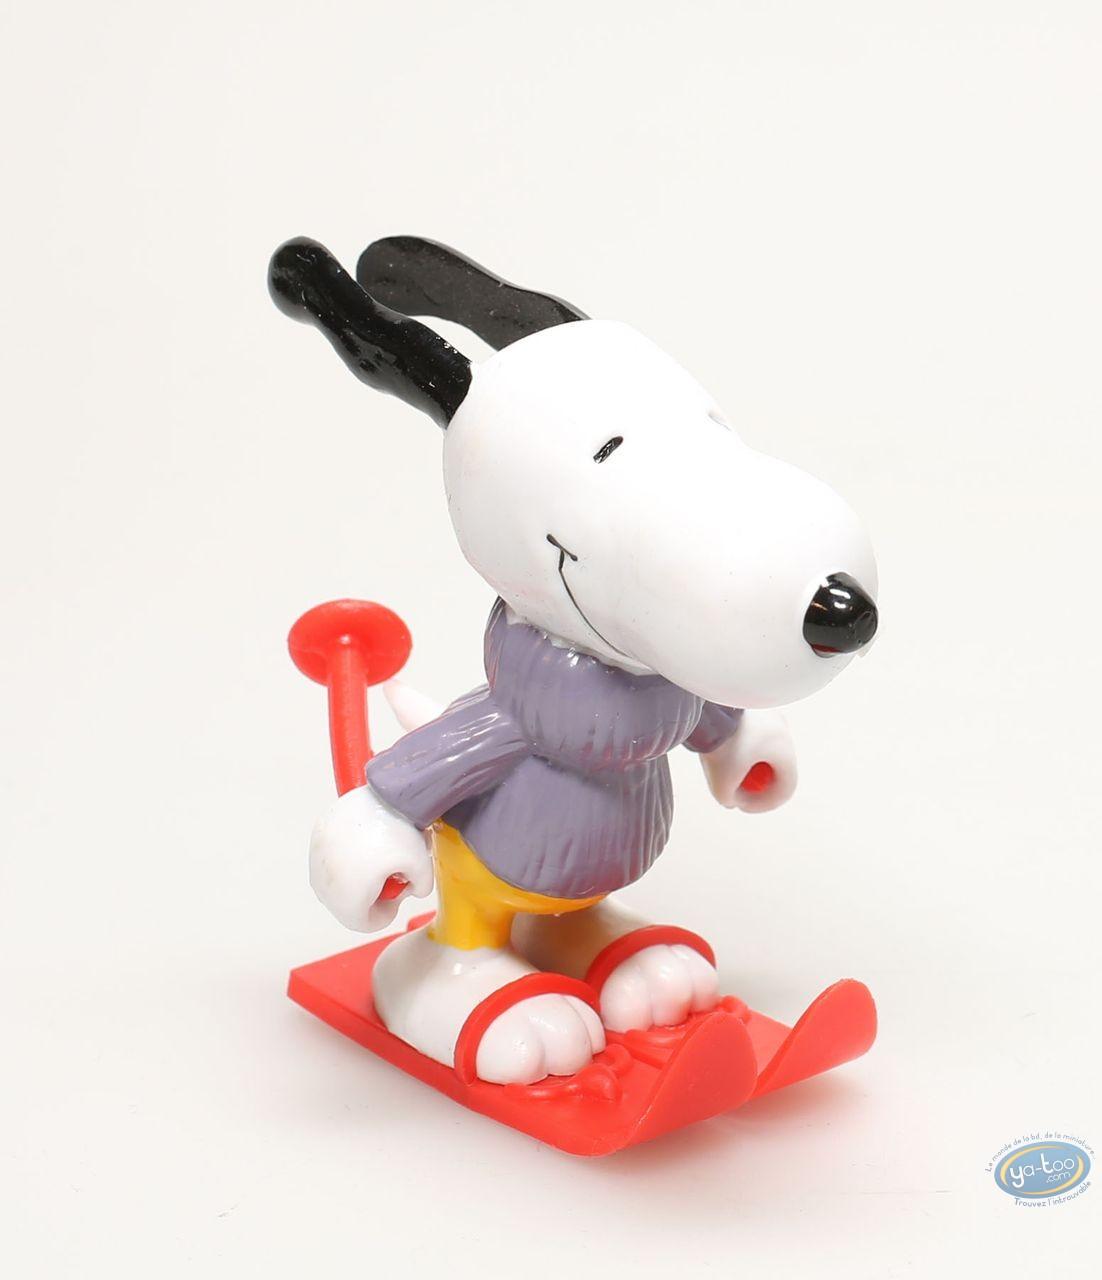 Figurine plastique, Snoopy : Snoopy ski